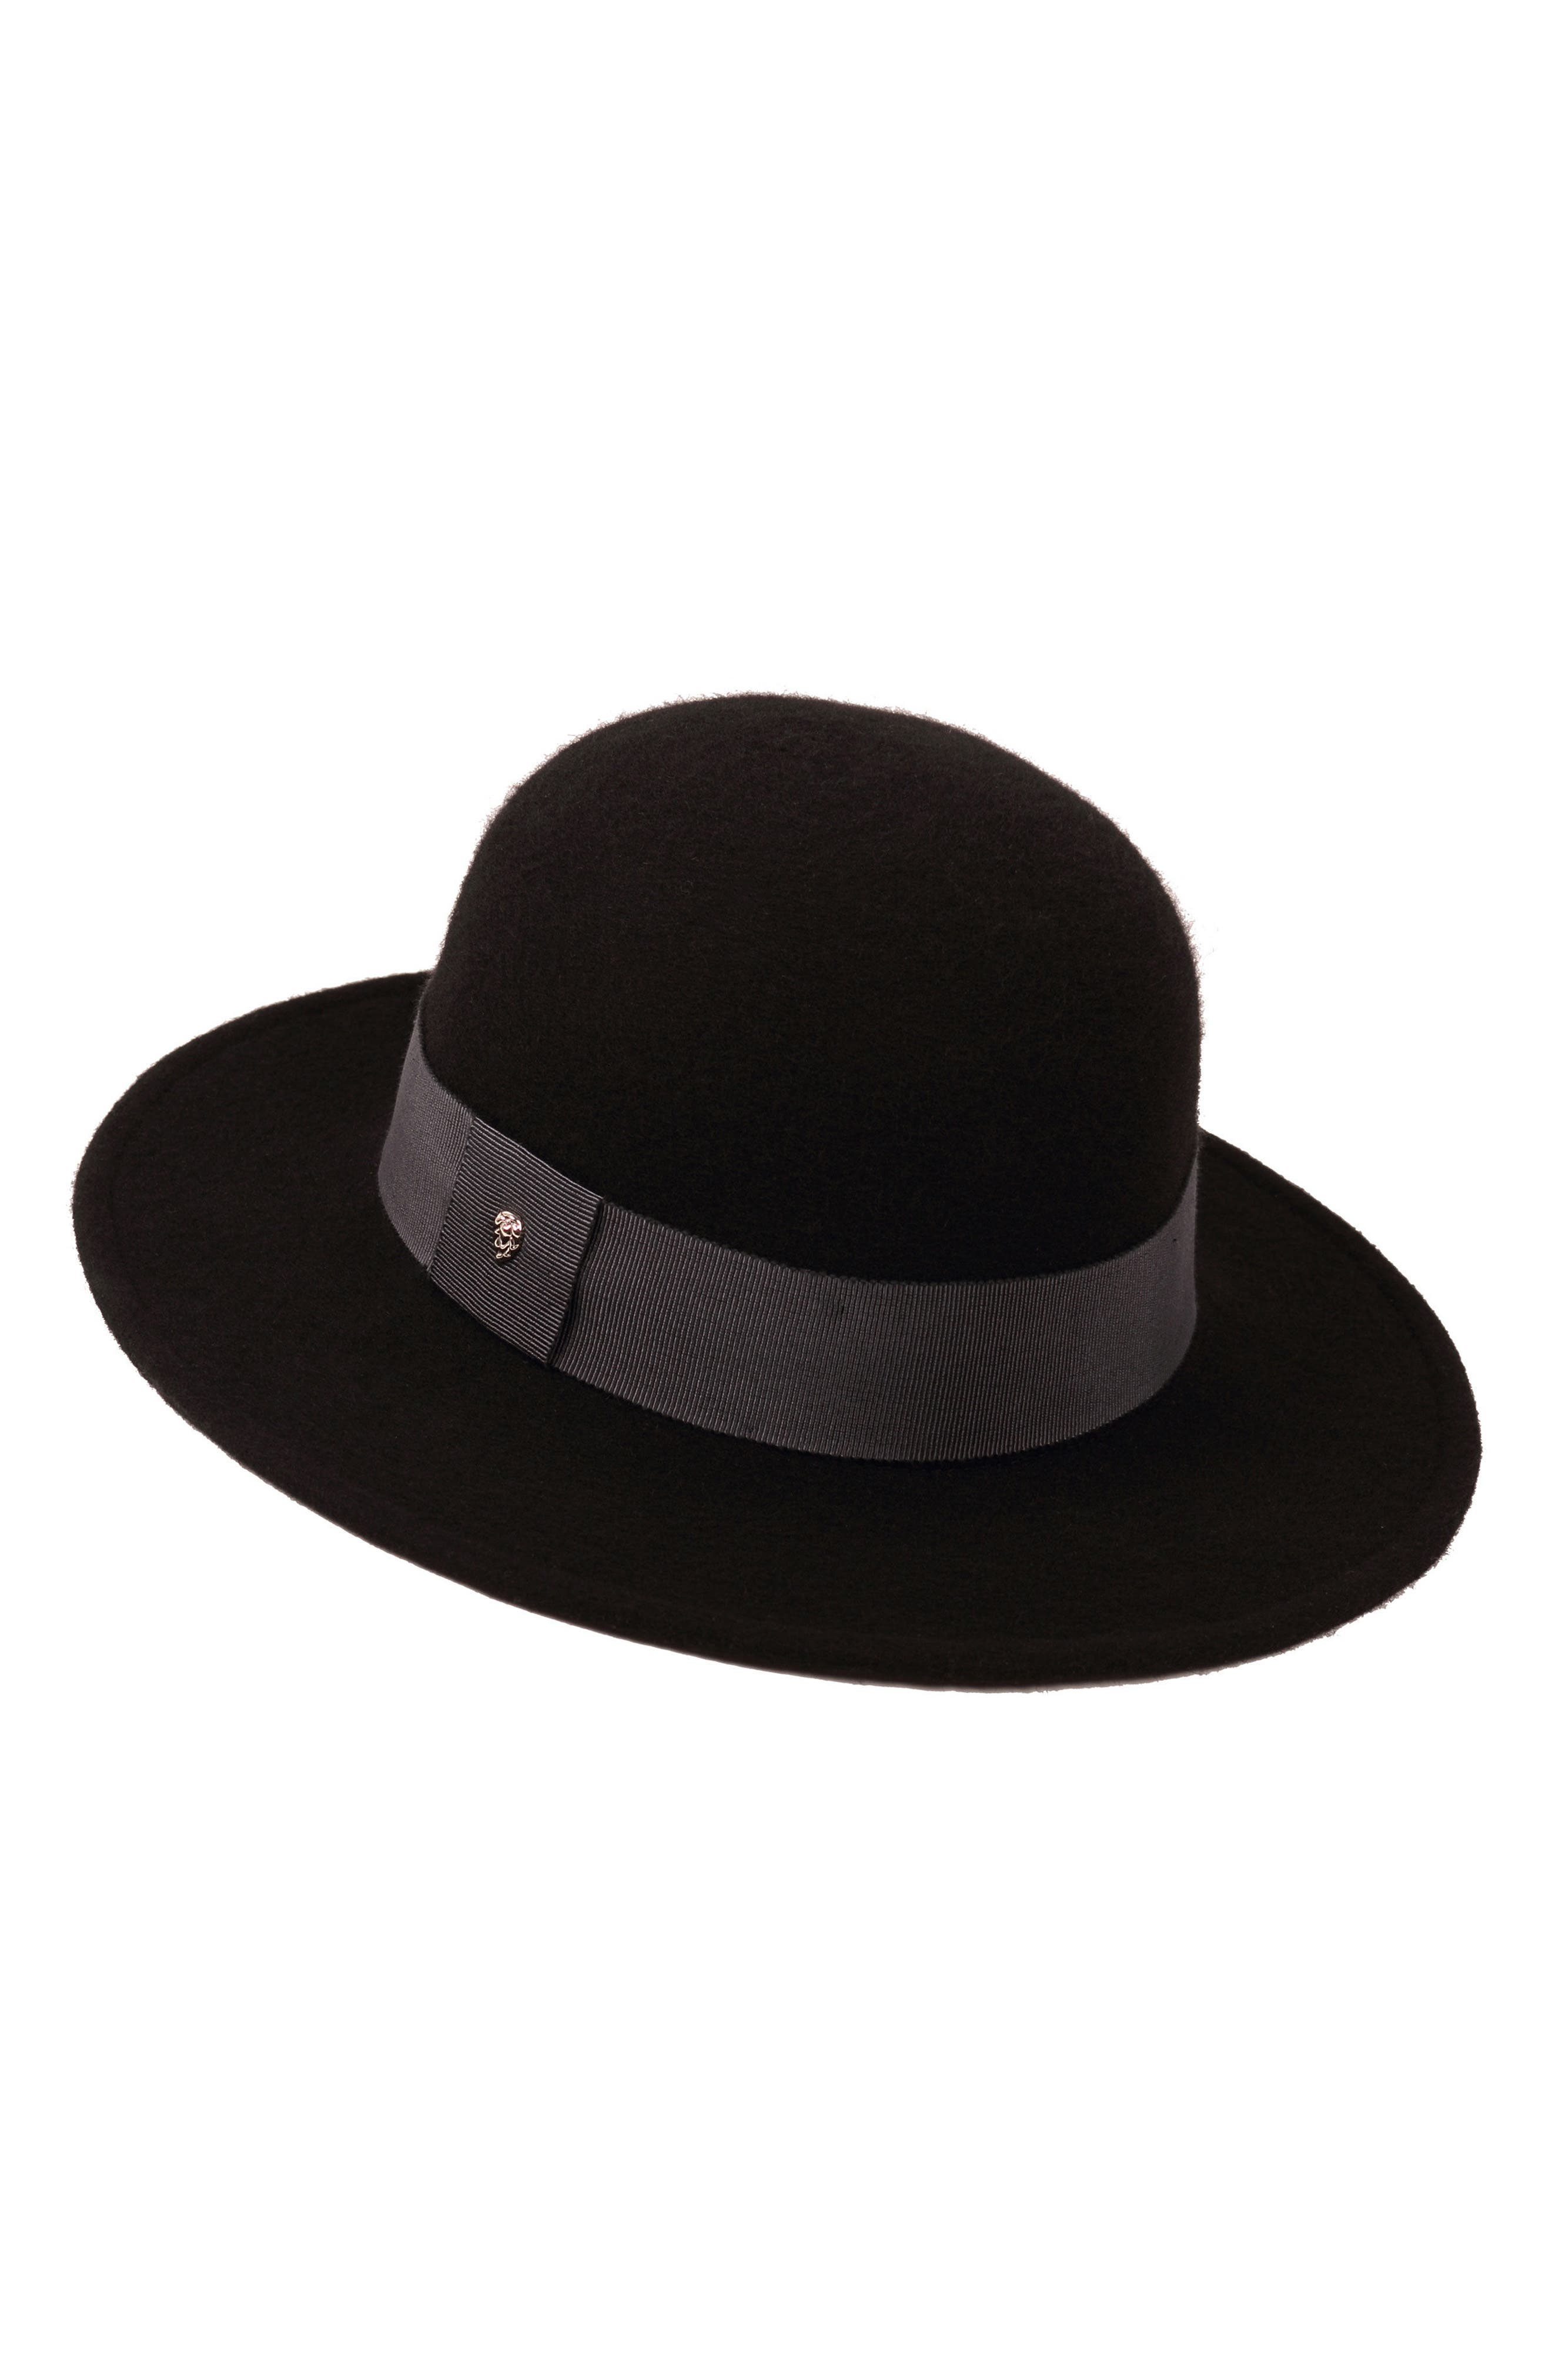 Helen Kaminski Wool Felt Round Hat